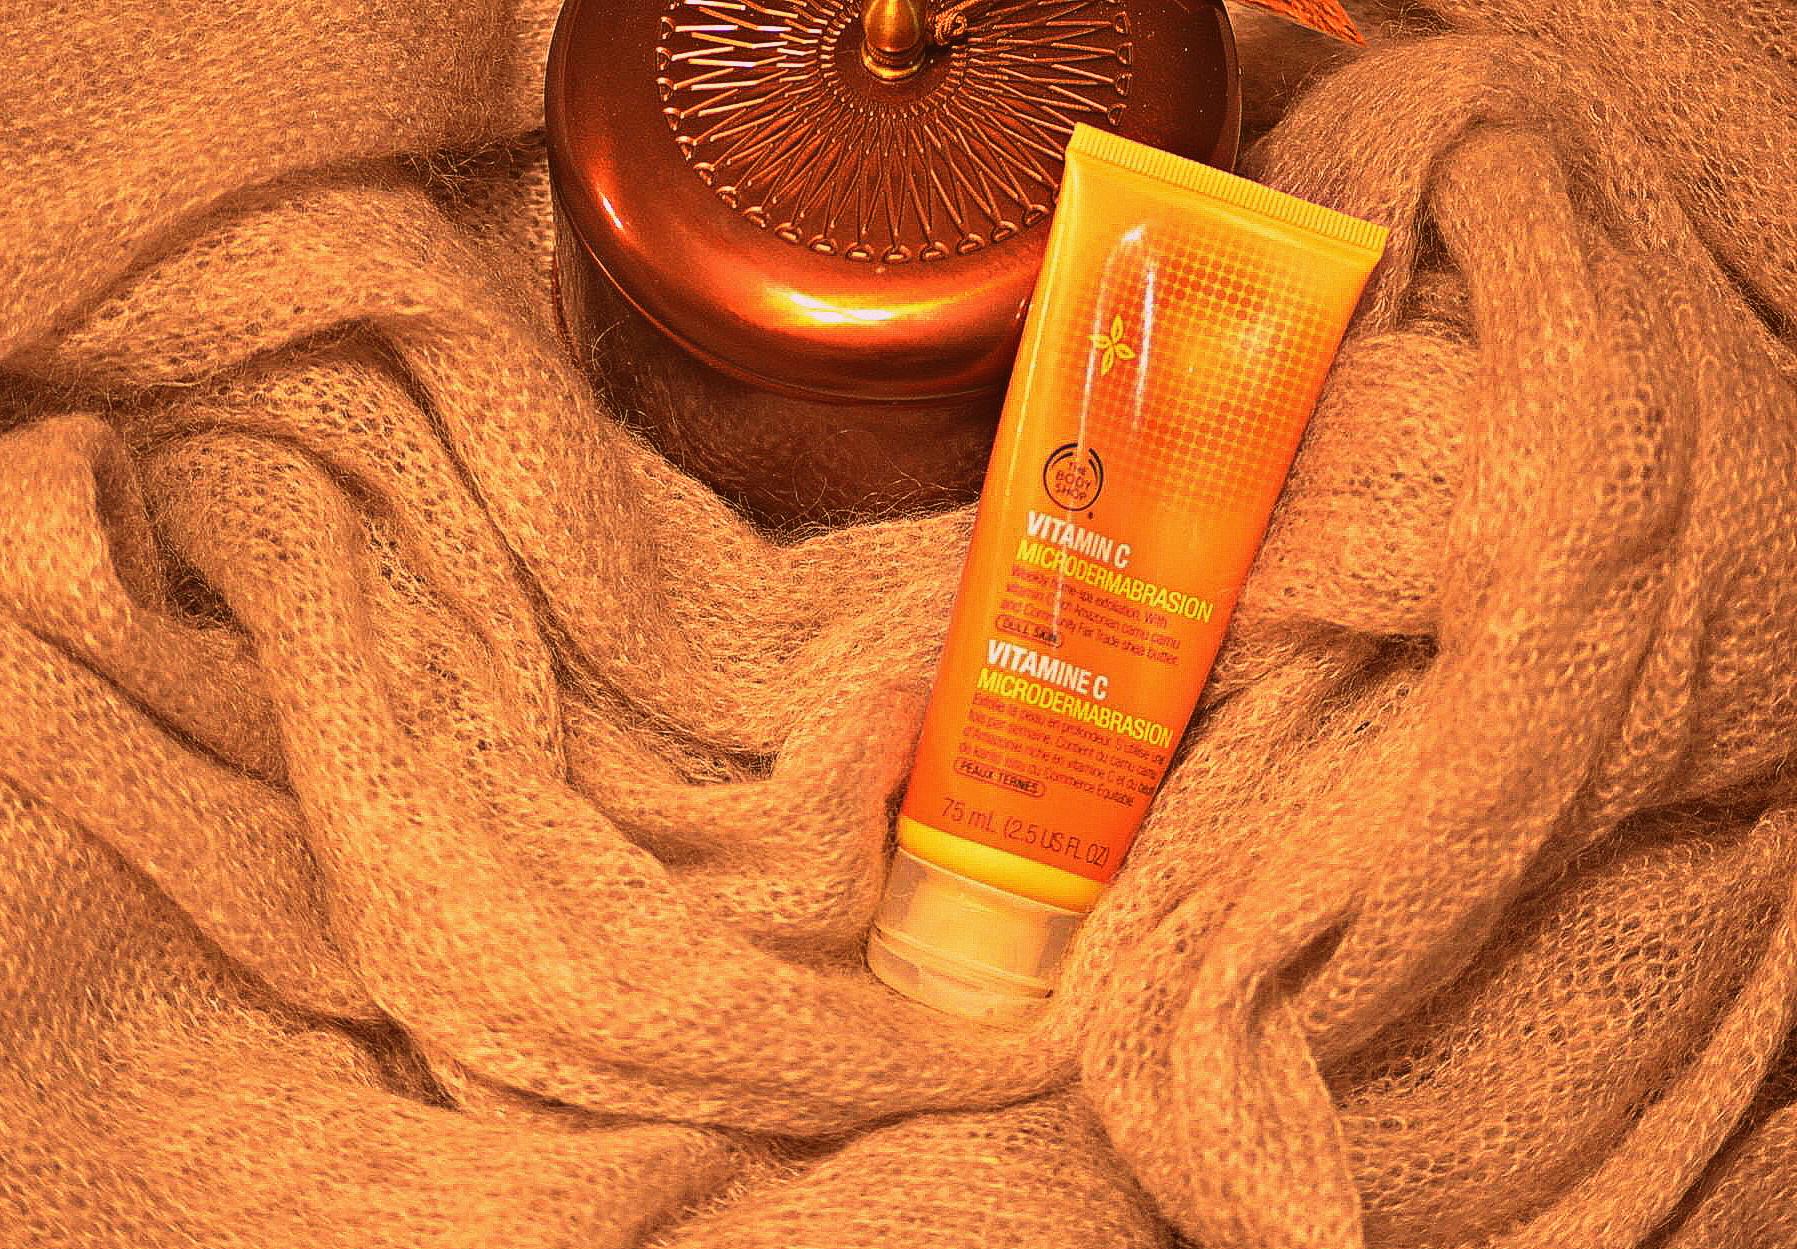 img 8435 - Vitamin C Skin Care Body Shop Review